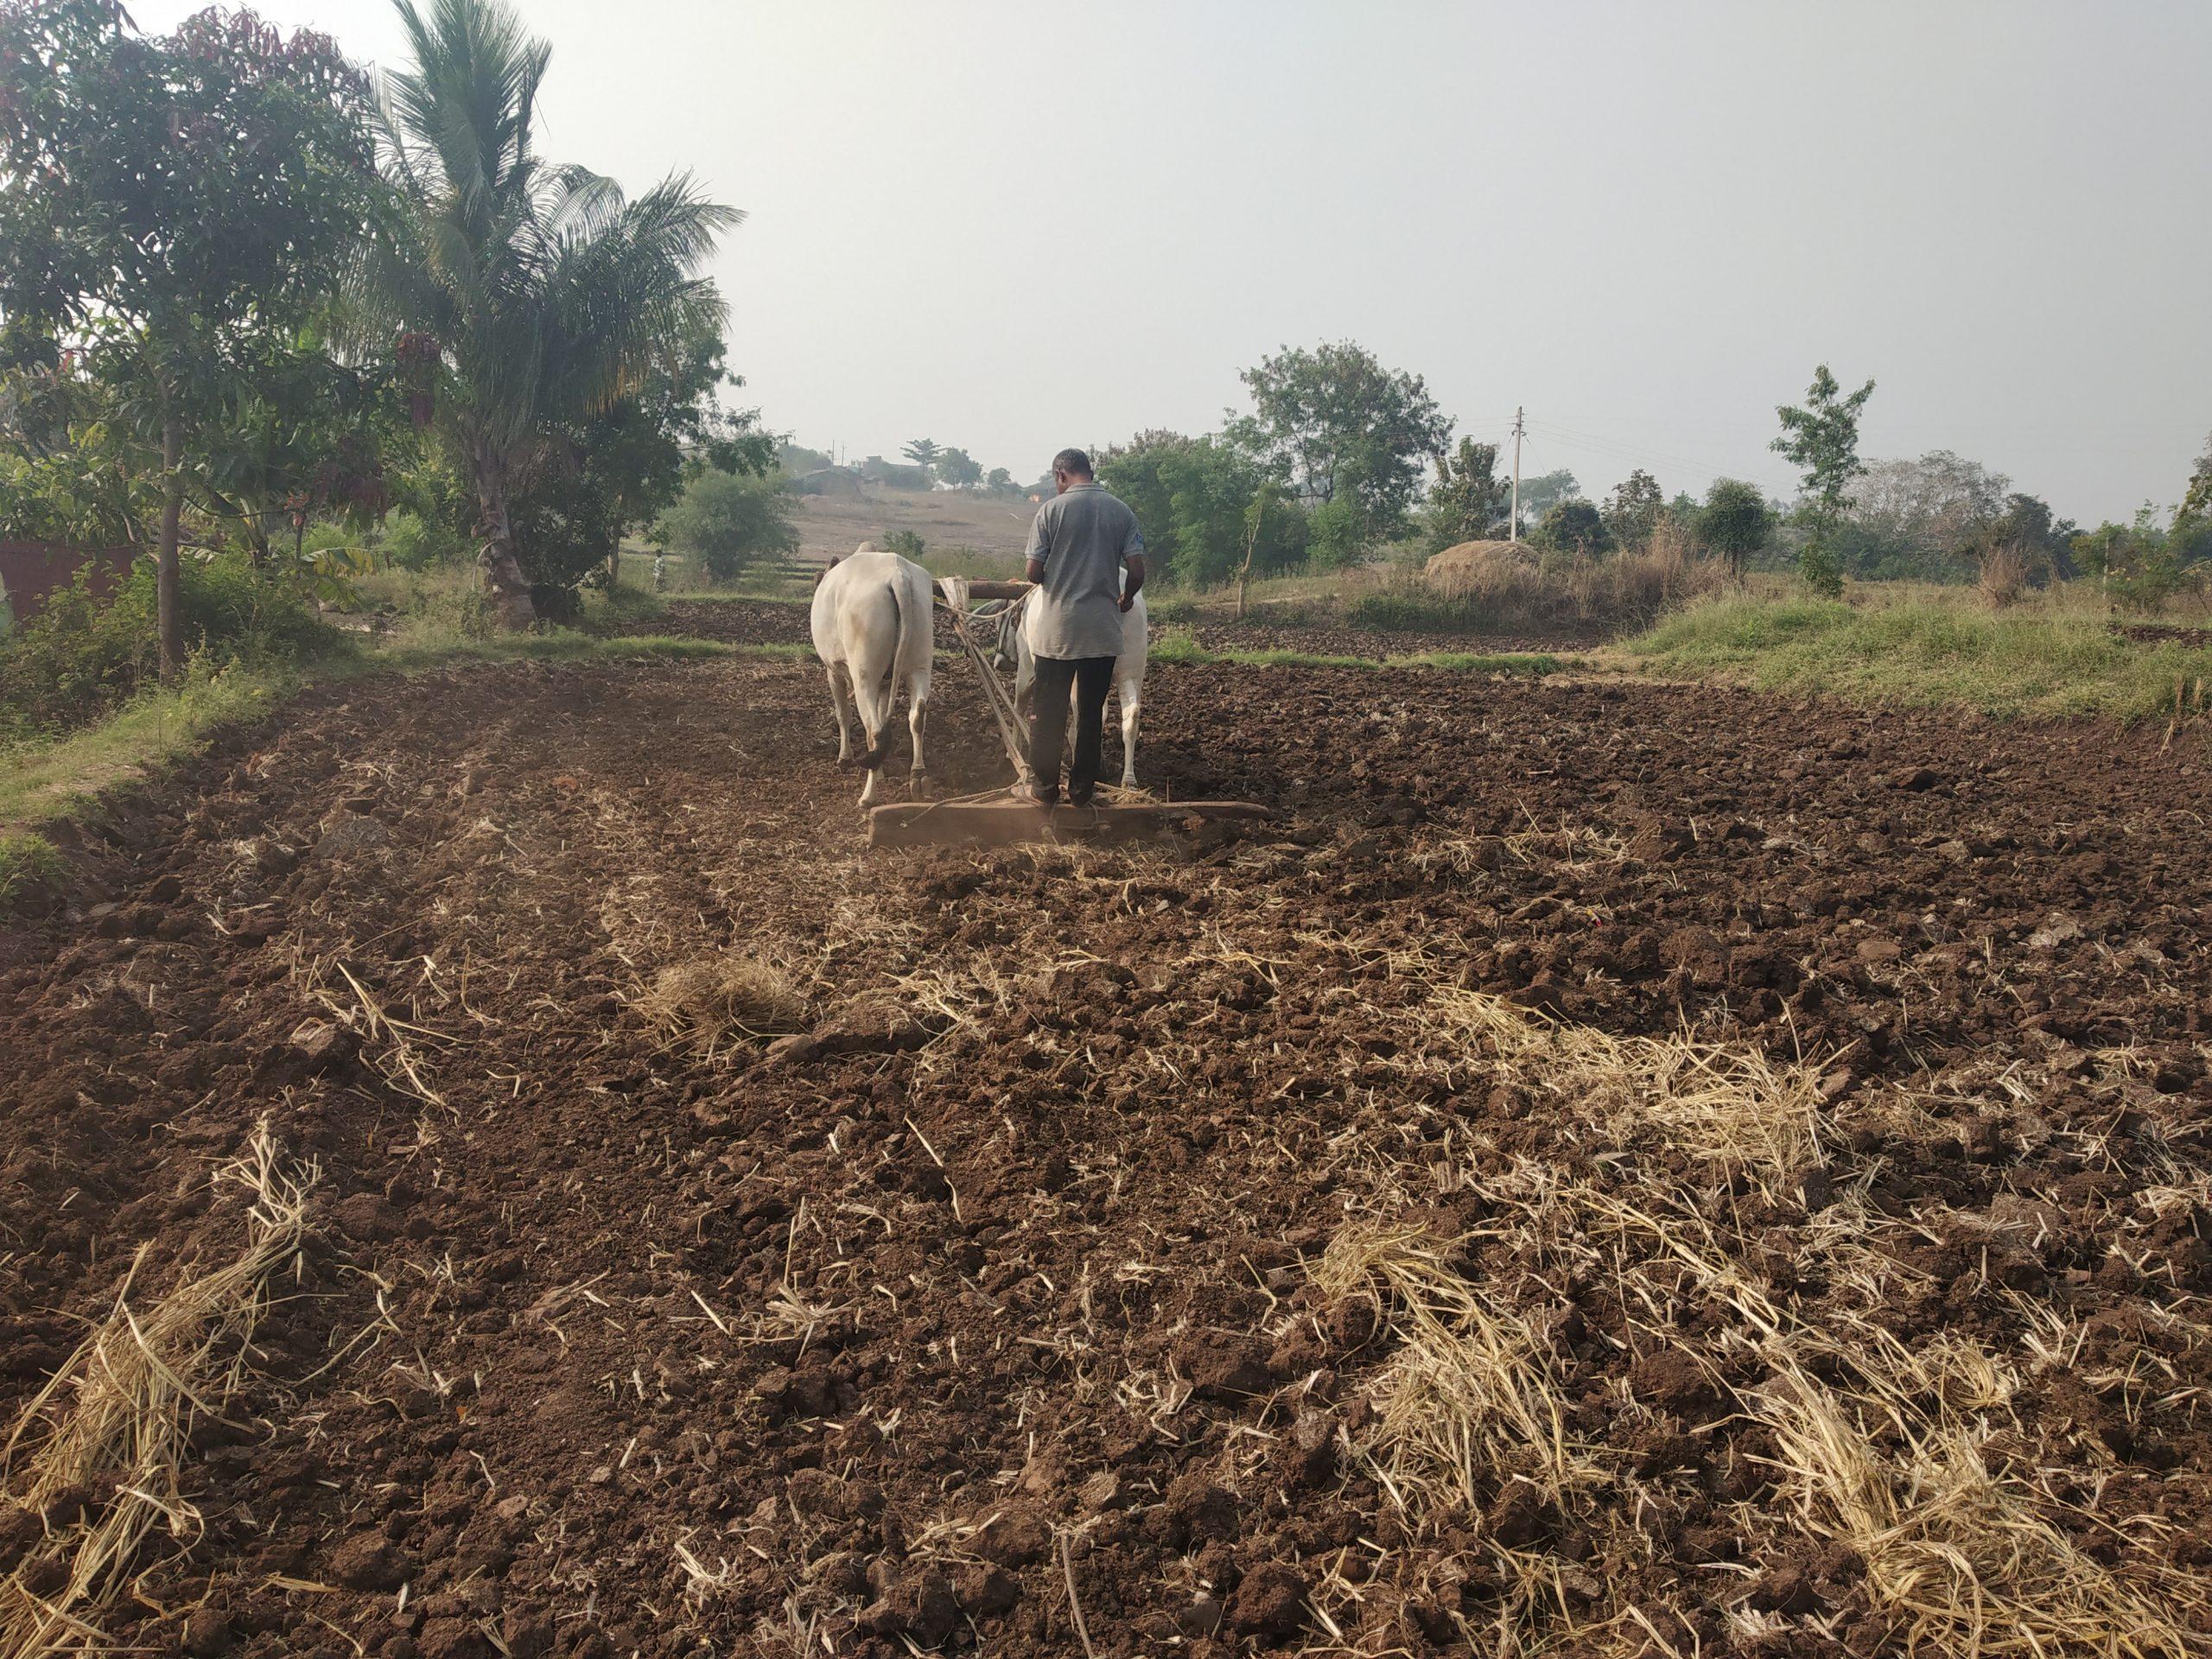 farmer ploughing the field using bull